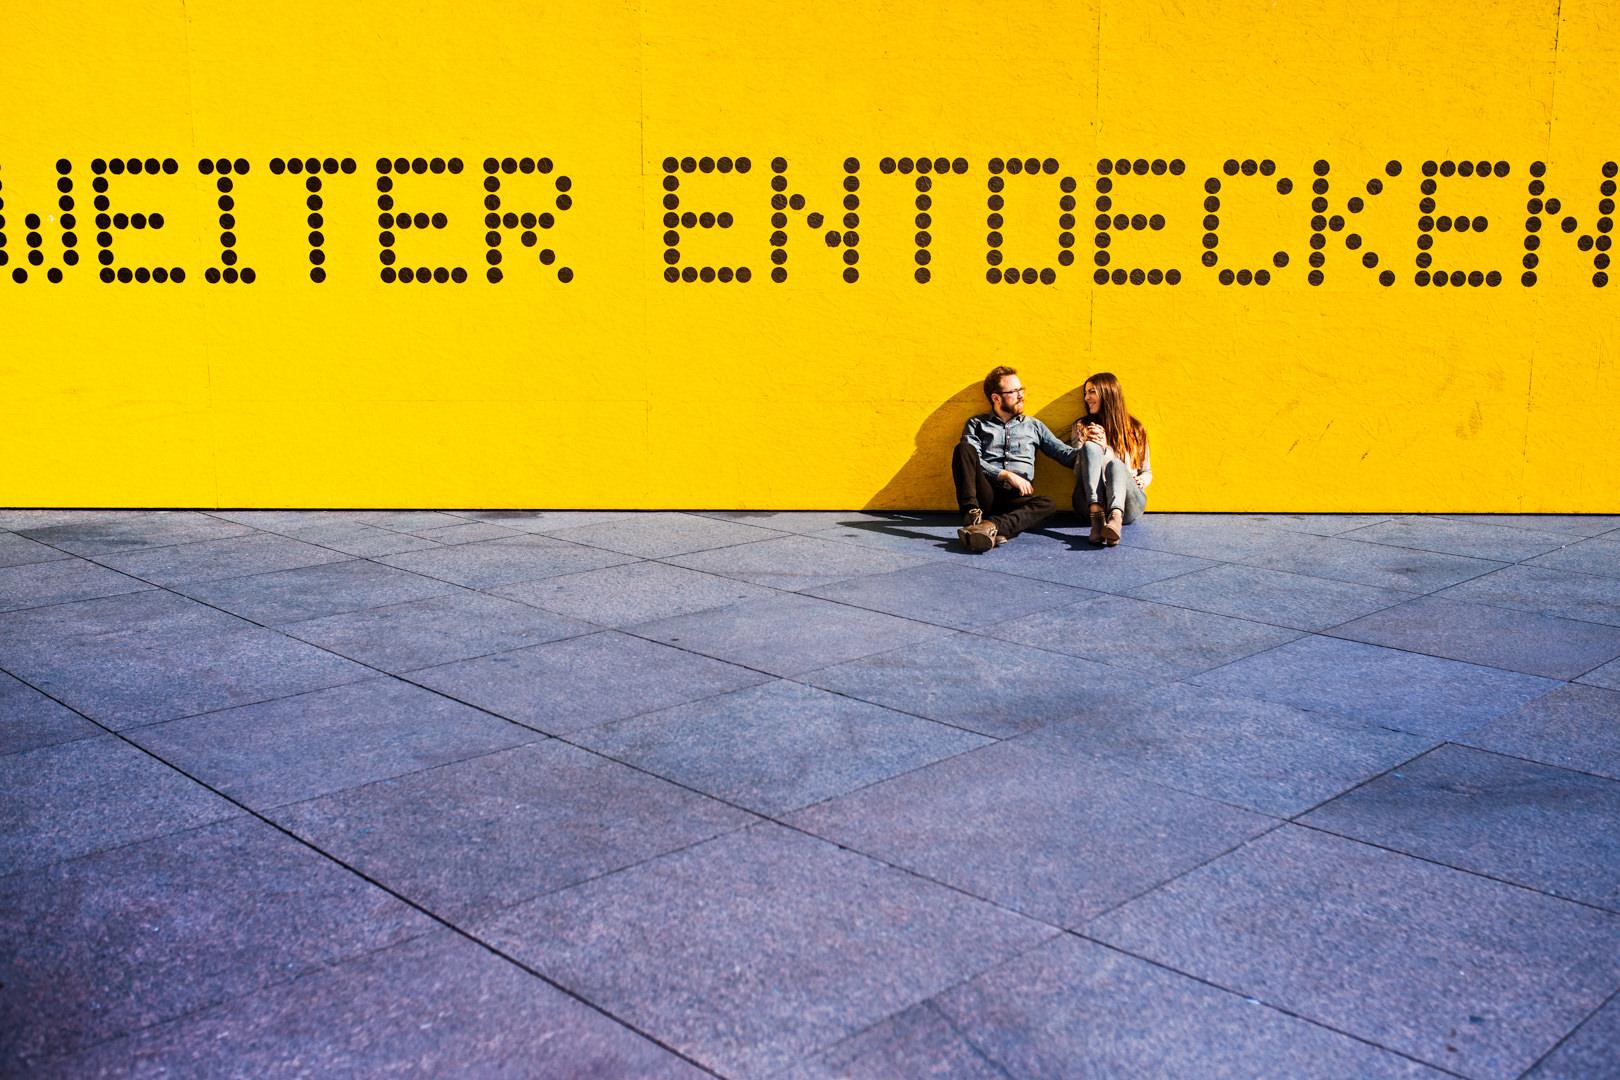 Preboda-Hamburgo-Maria-Carles-engagement-Rafael-Torres-fotografo-bodas-sevilla-madrid-barcelona-wedding-photographer--5.jpg